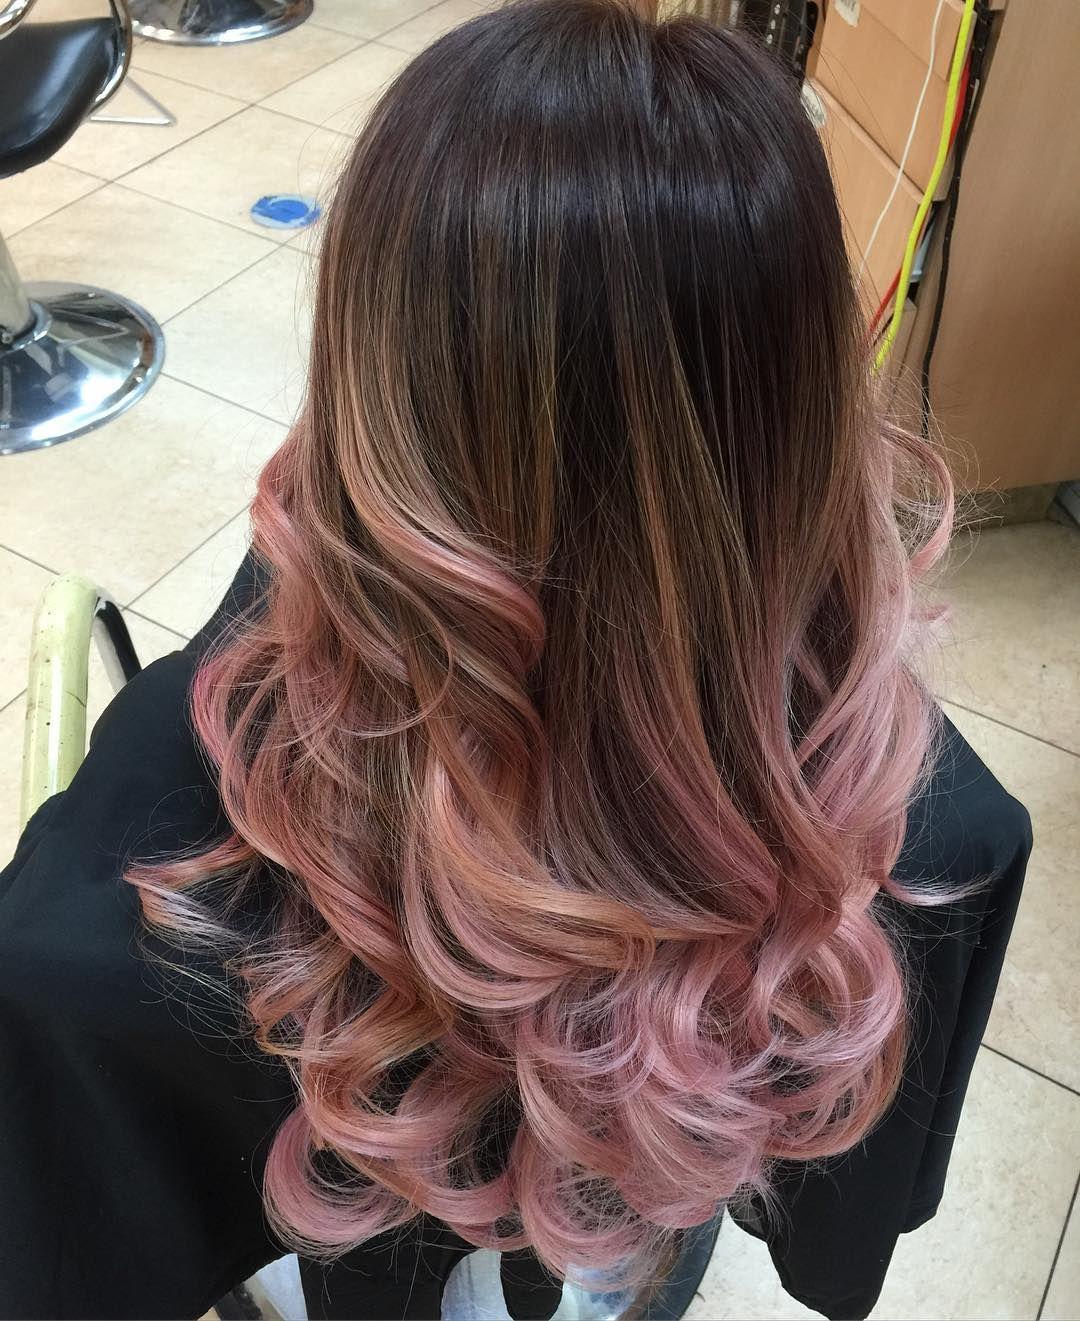 Strawberryswirl Candyhair Mylilpony Behindthechair Modernsalon Colorcorrection Rosegold Rosegoldhair H Balayage Hair Red Balayage Hair Hair Color Pink